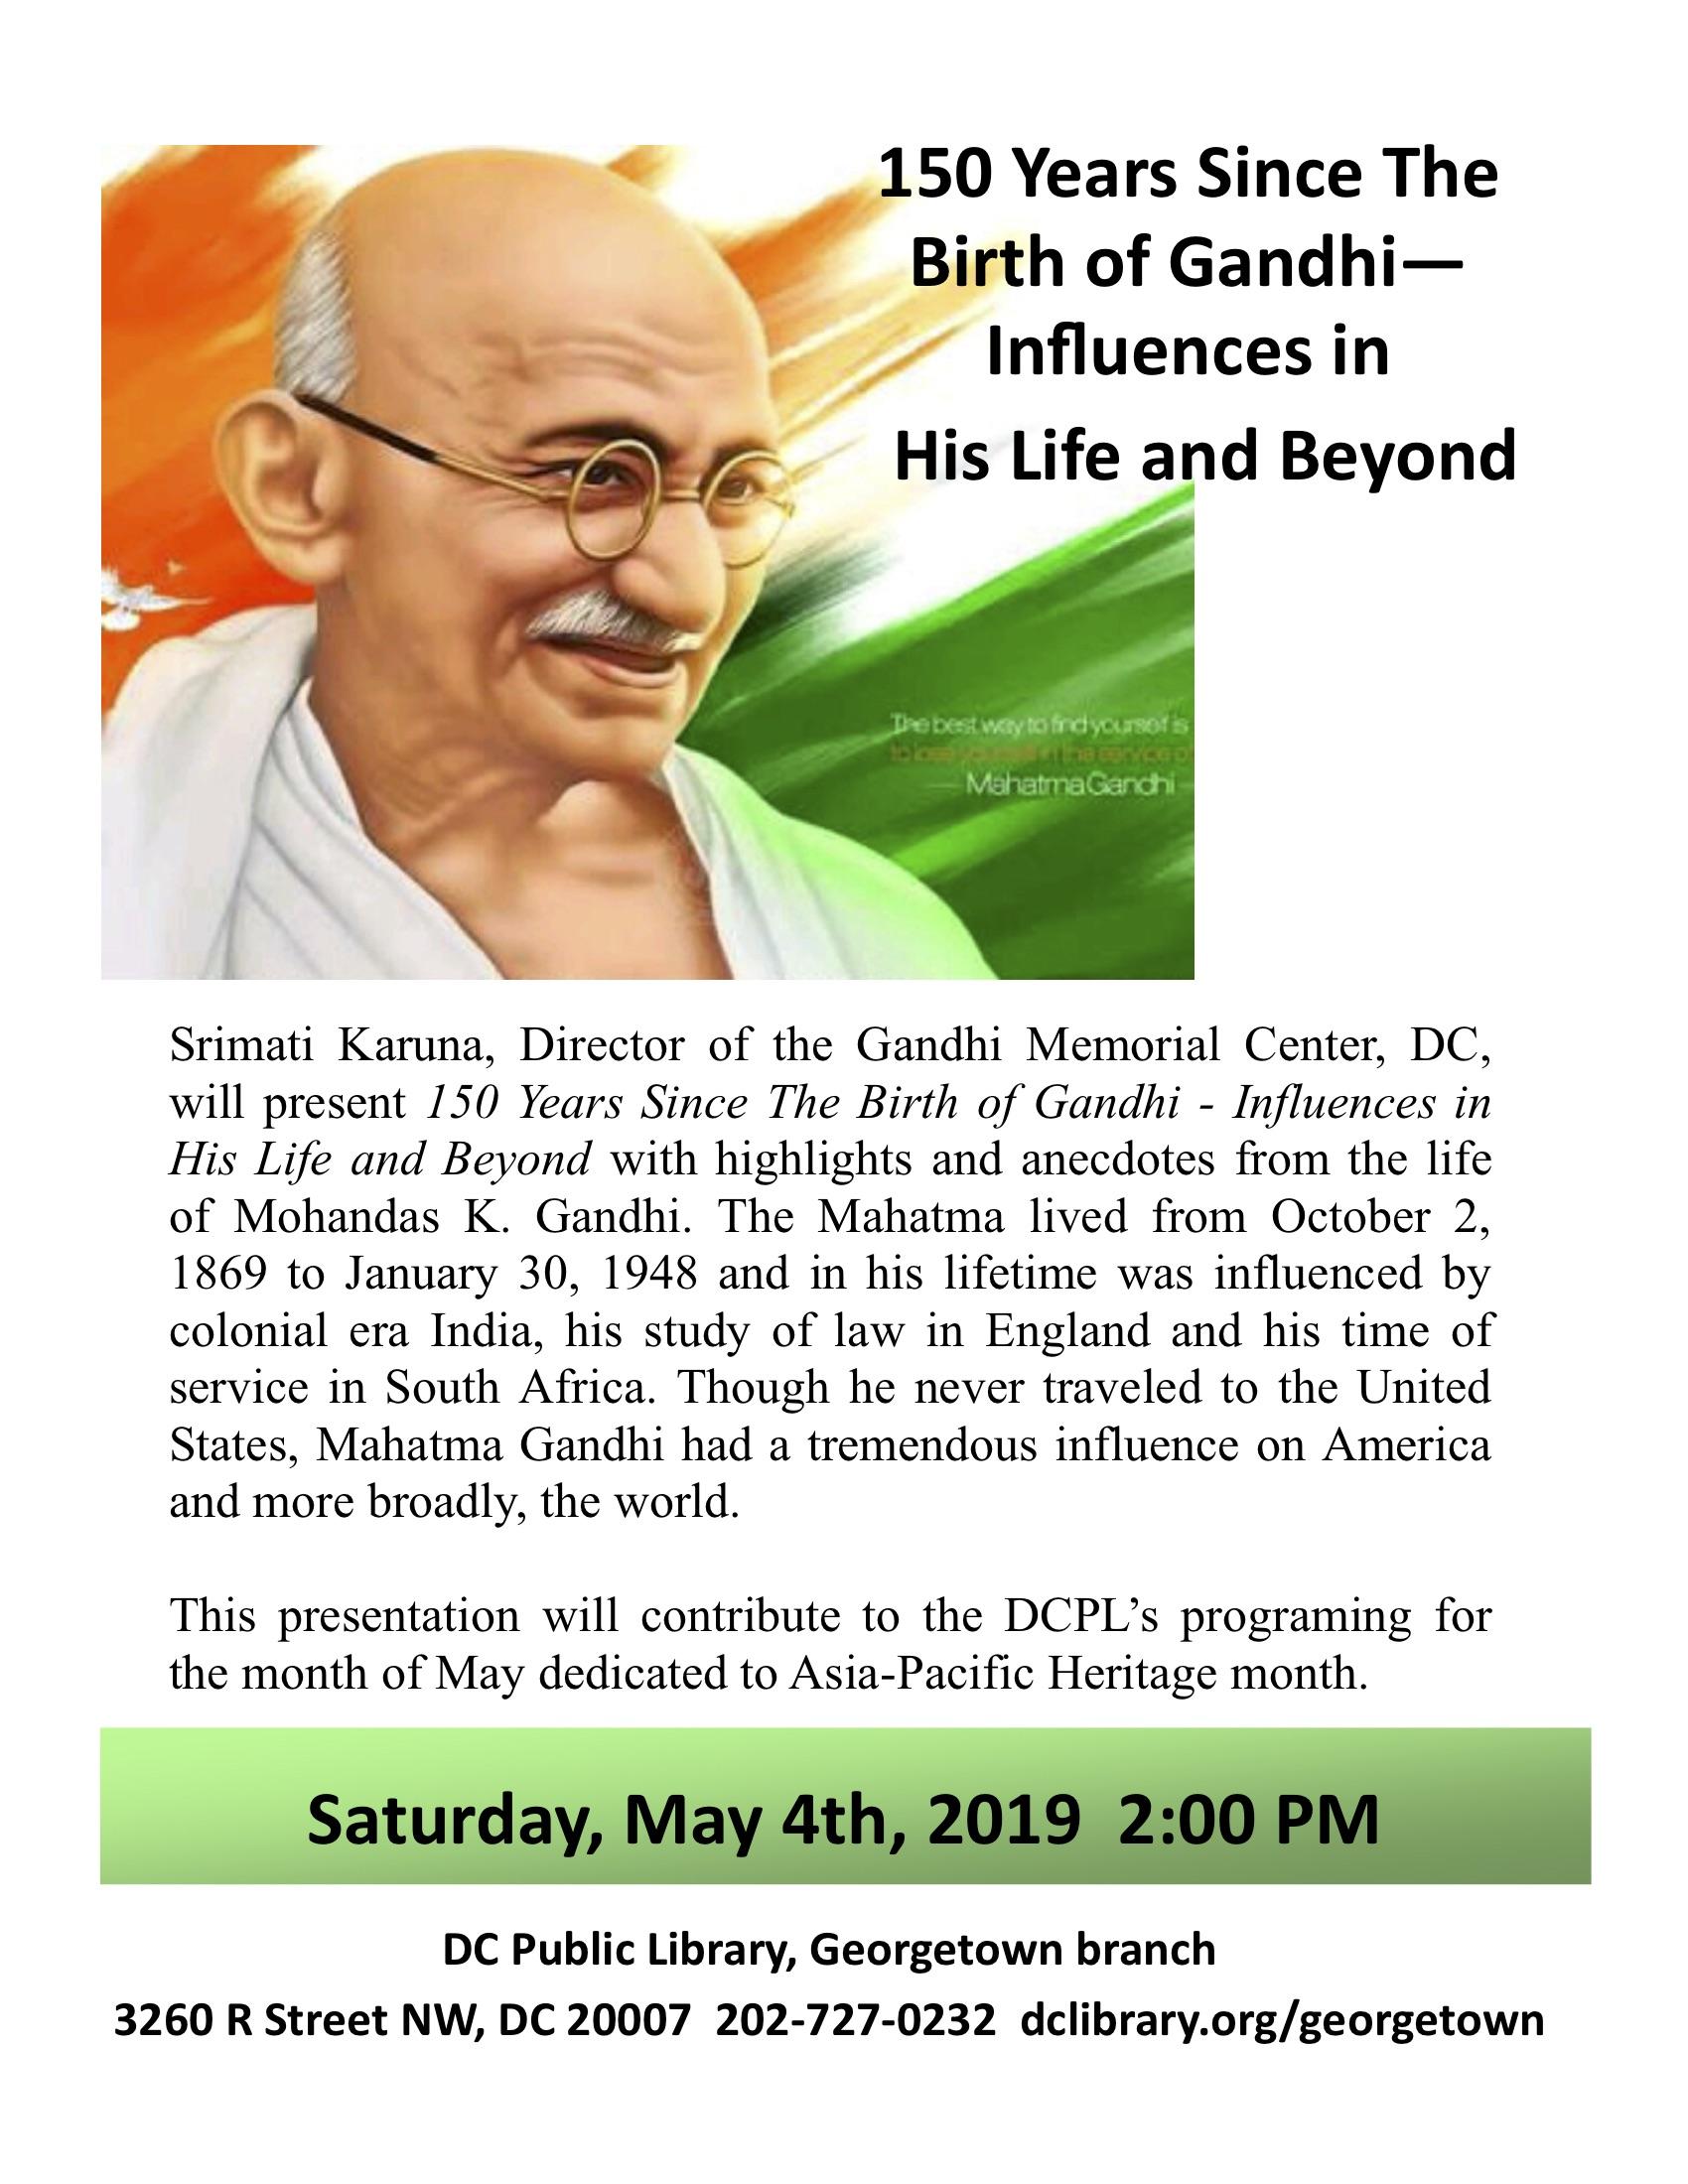 Gandhi Flyer May 4, 2019  PDF.jpg